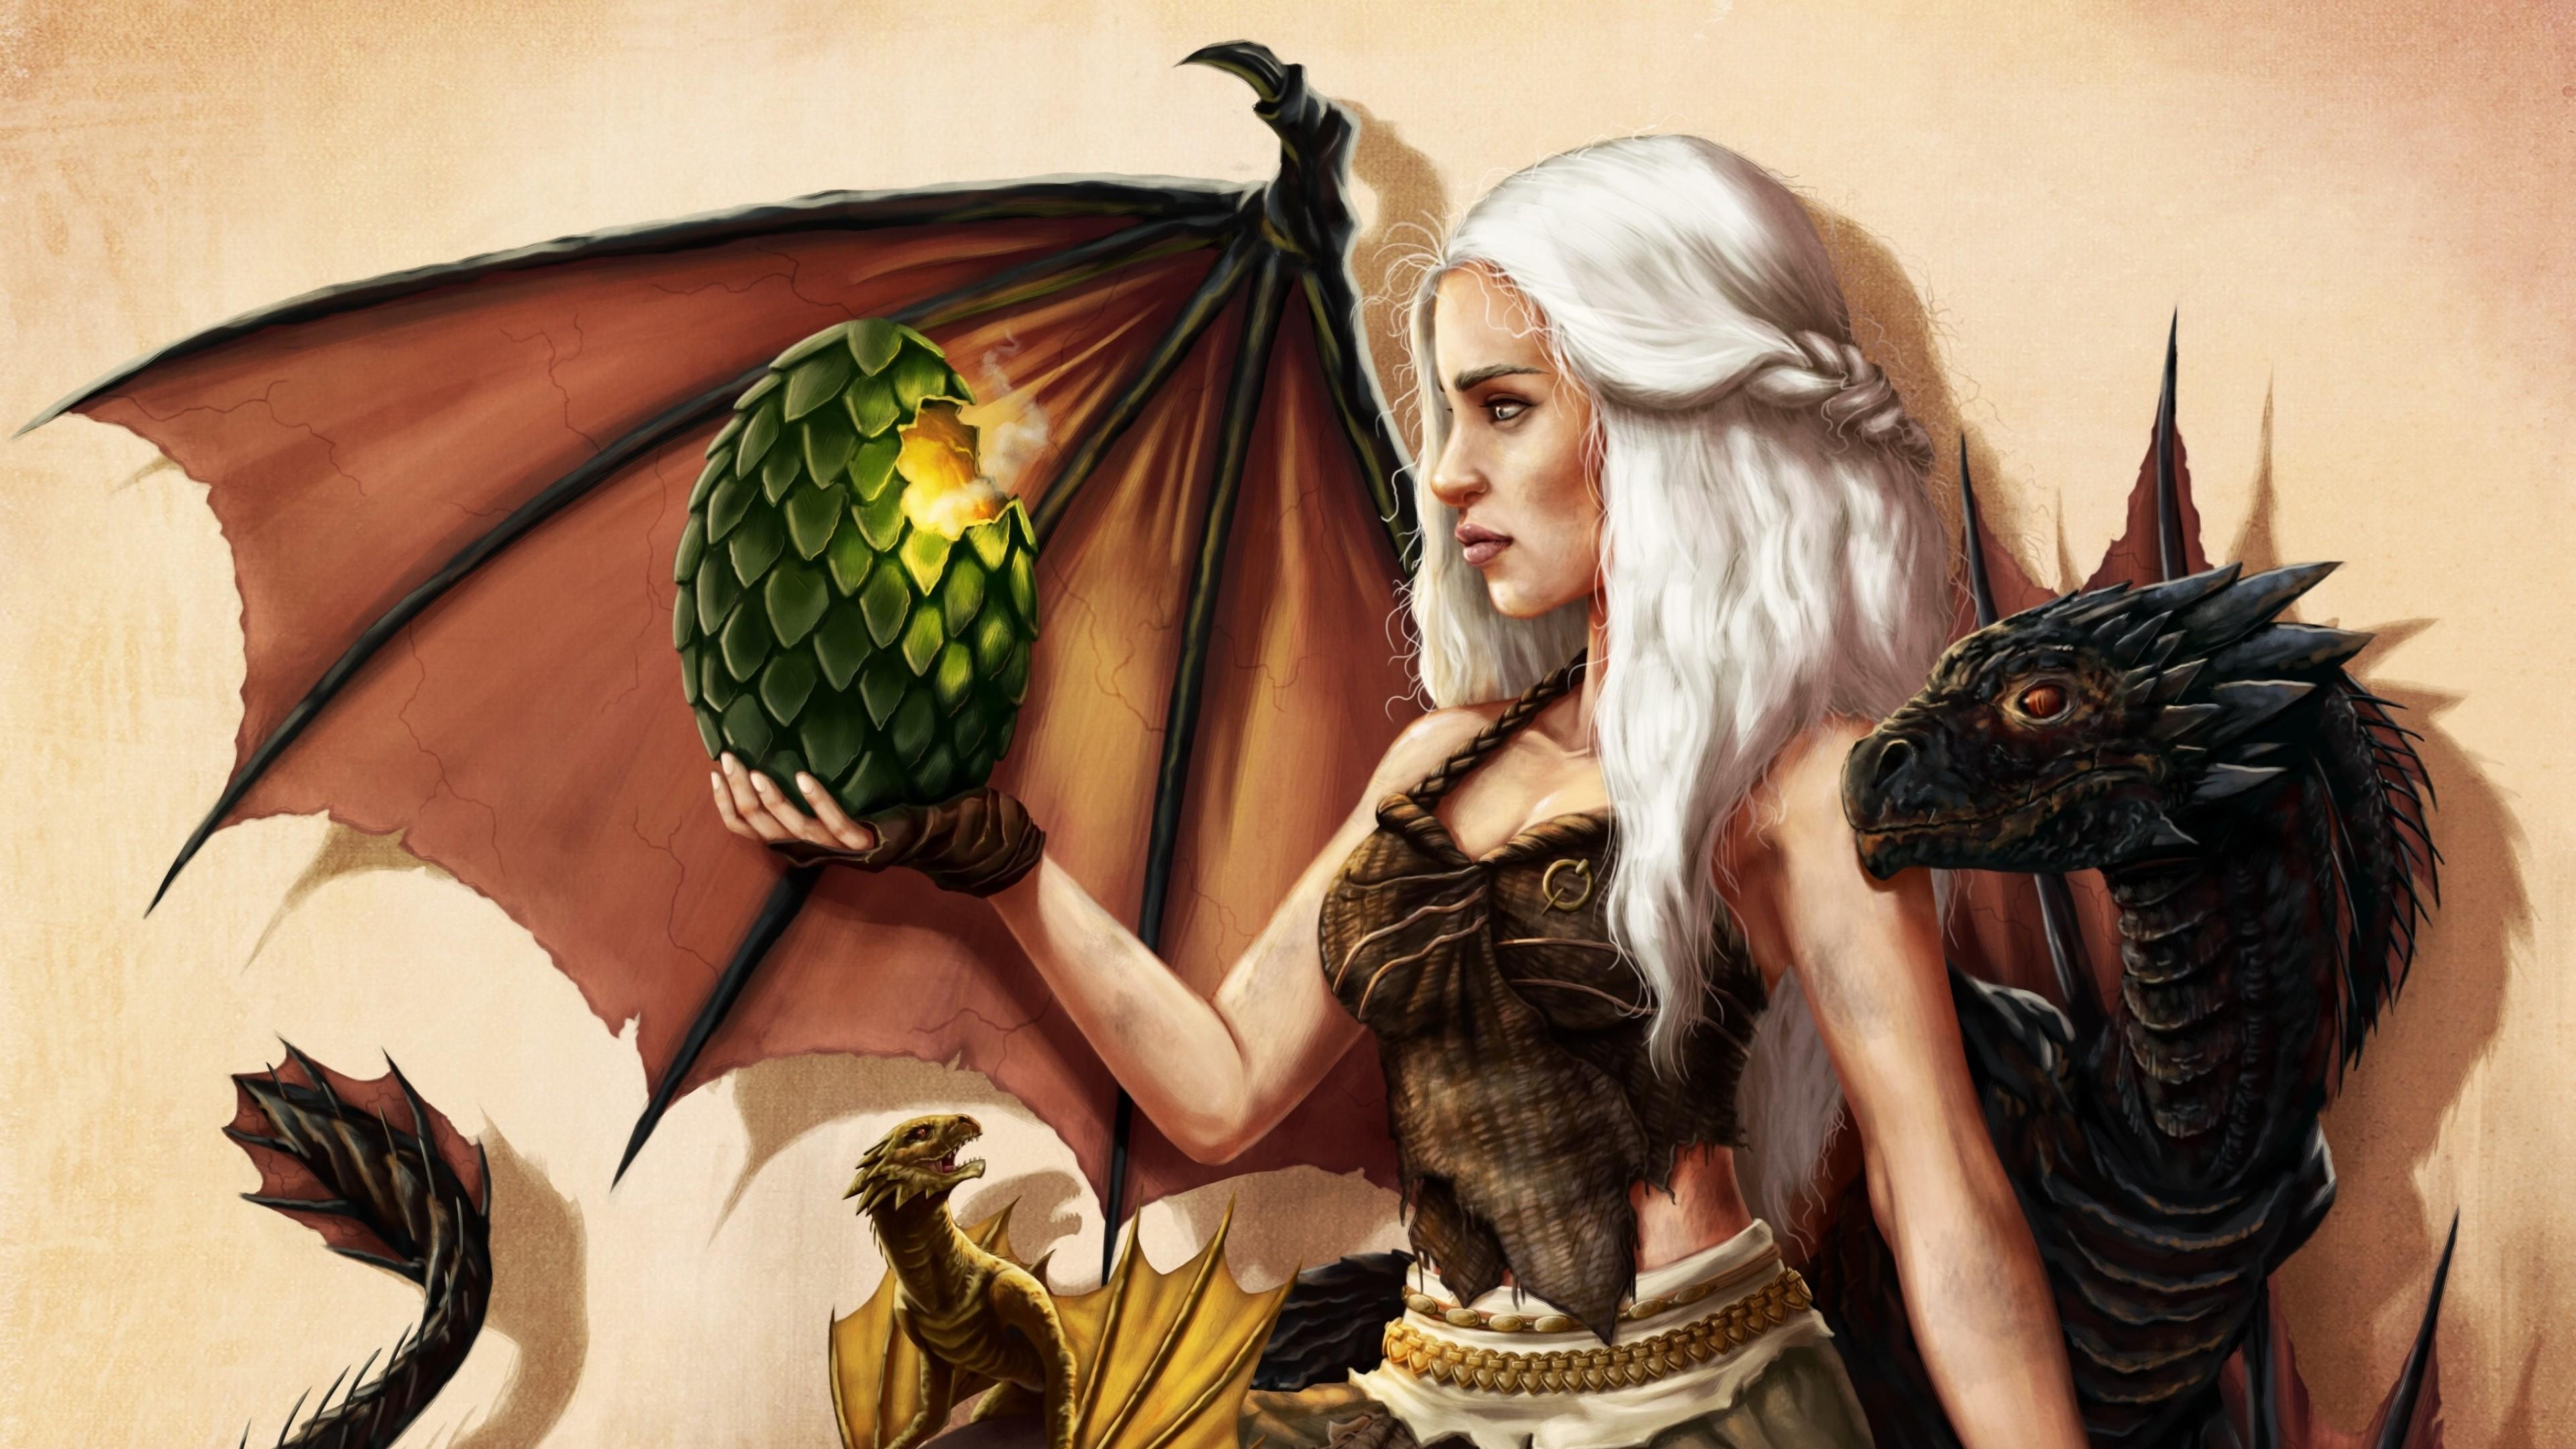 Preview wallpaper game of thrones, art, emilia clarke, daenerys targaryen  3840×2160